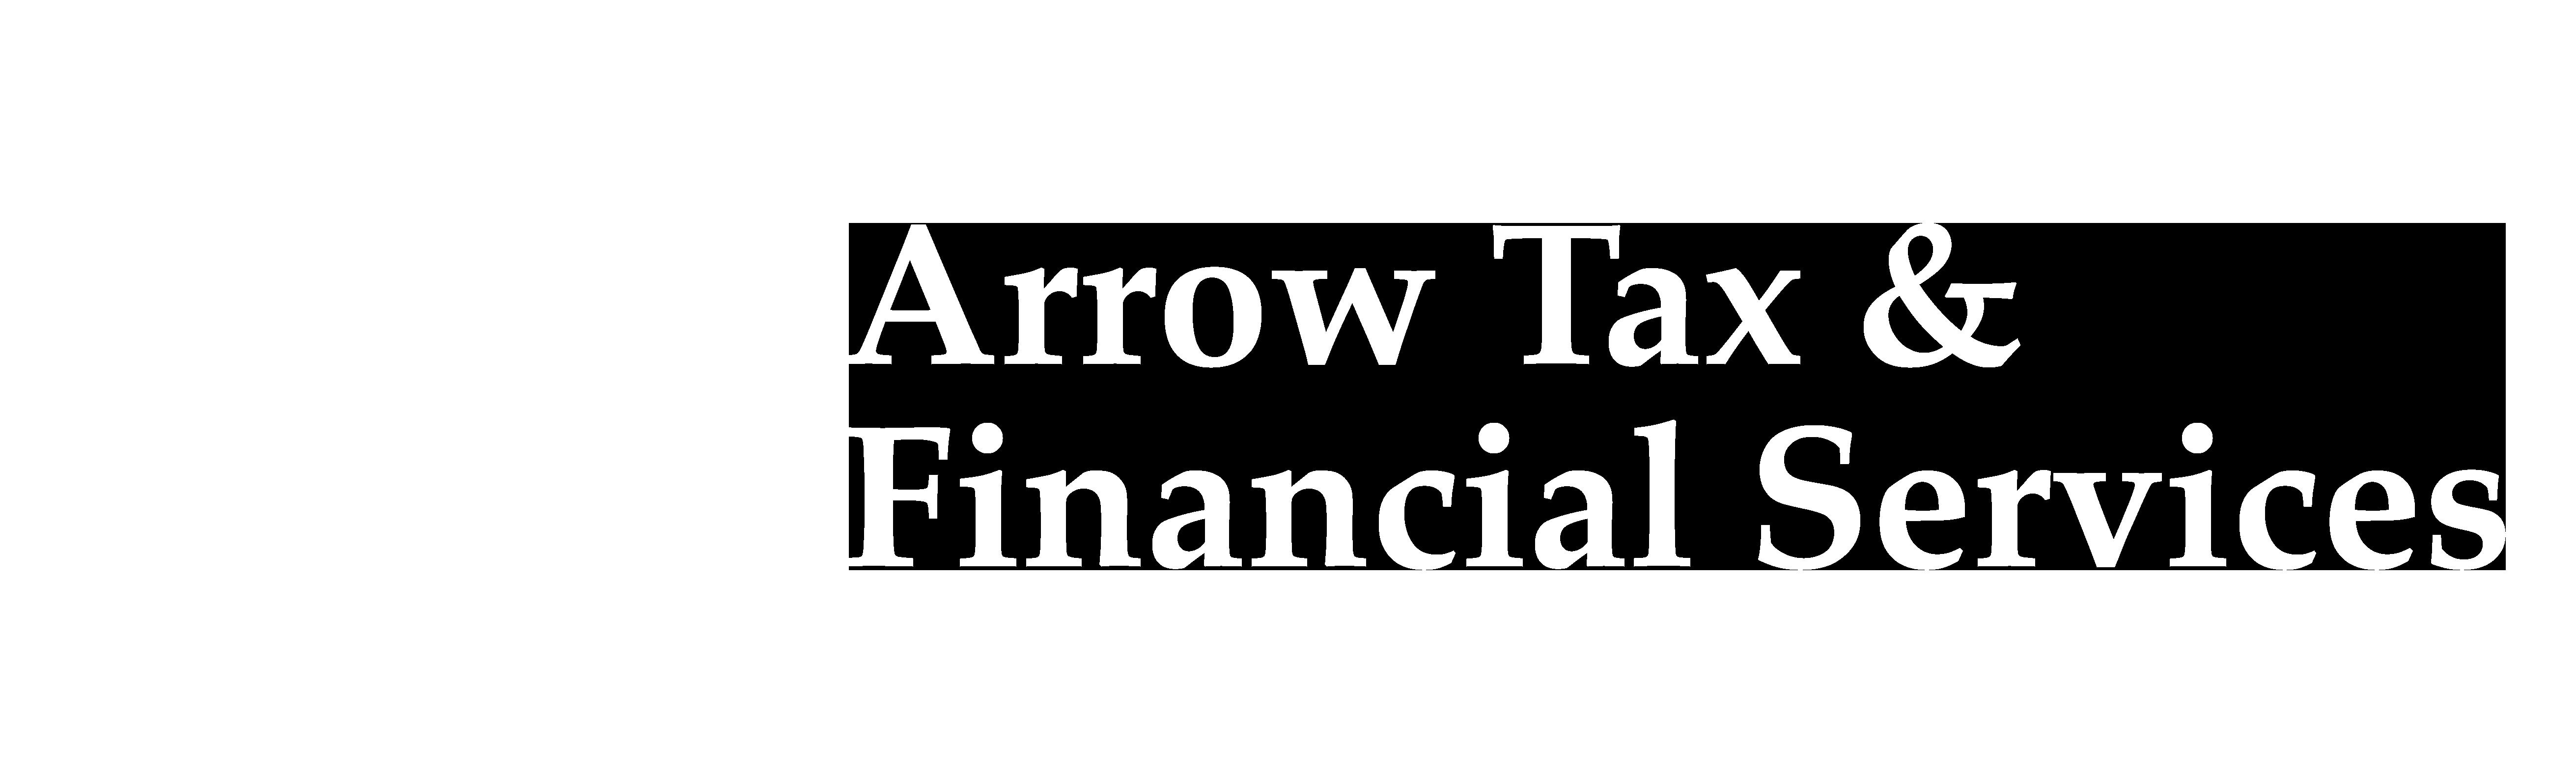 Arrow Tax & Financial Services